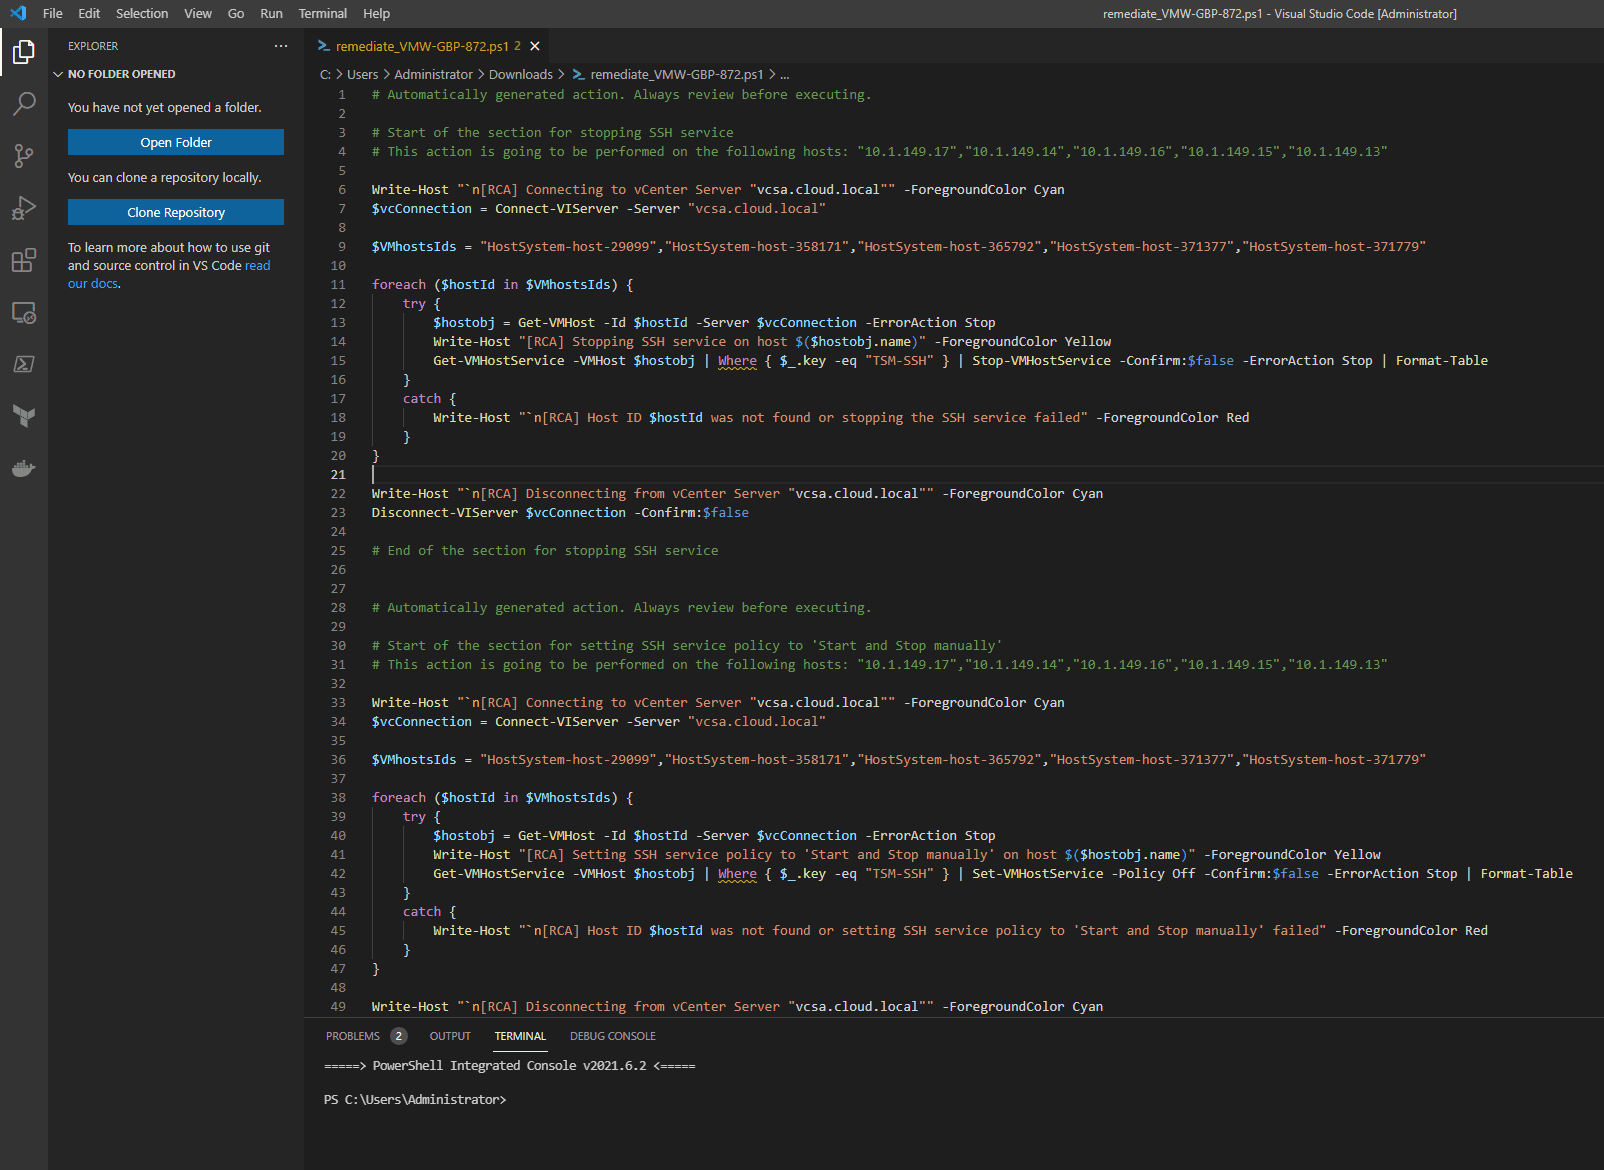 Opening the script inside of Visual Studio Code